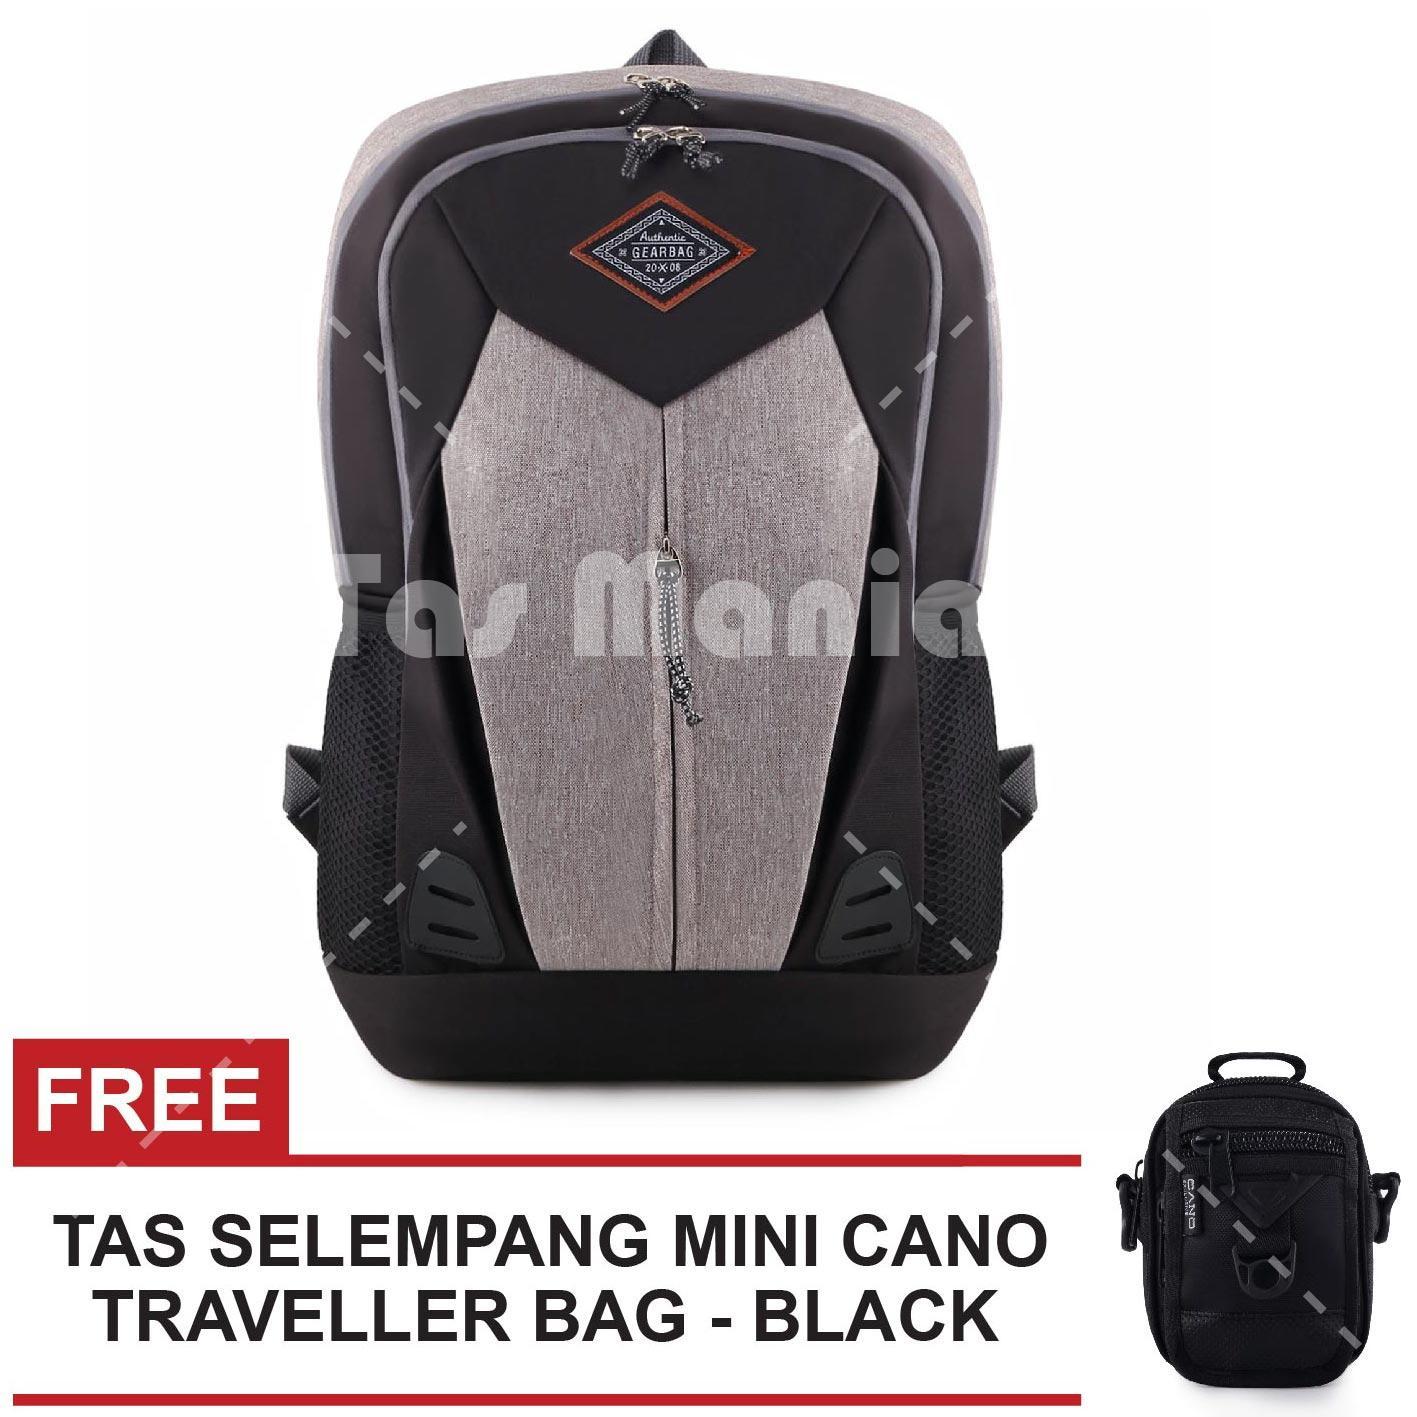 Tas Ransel Gear Bag Sylvester 2.0 Dailypack Tas Laptop Backpack - Grey + FREE Tas Selempang